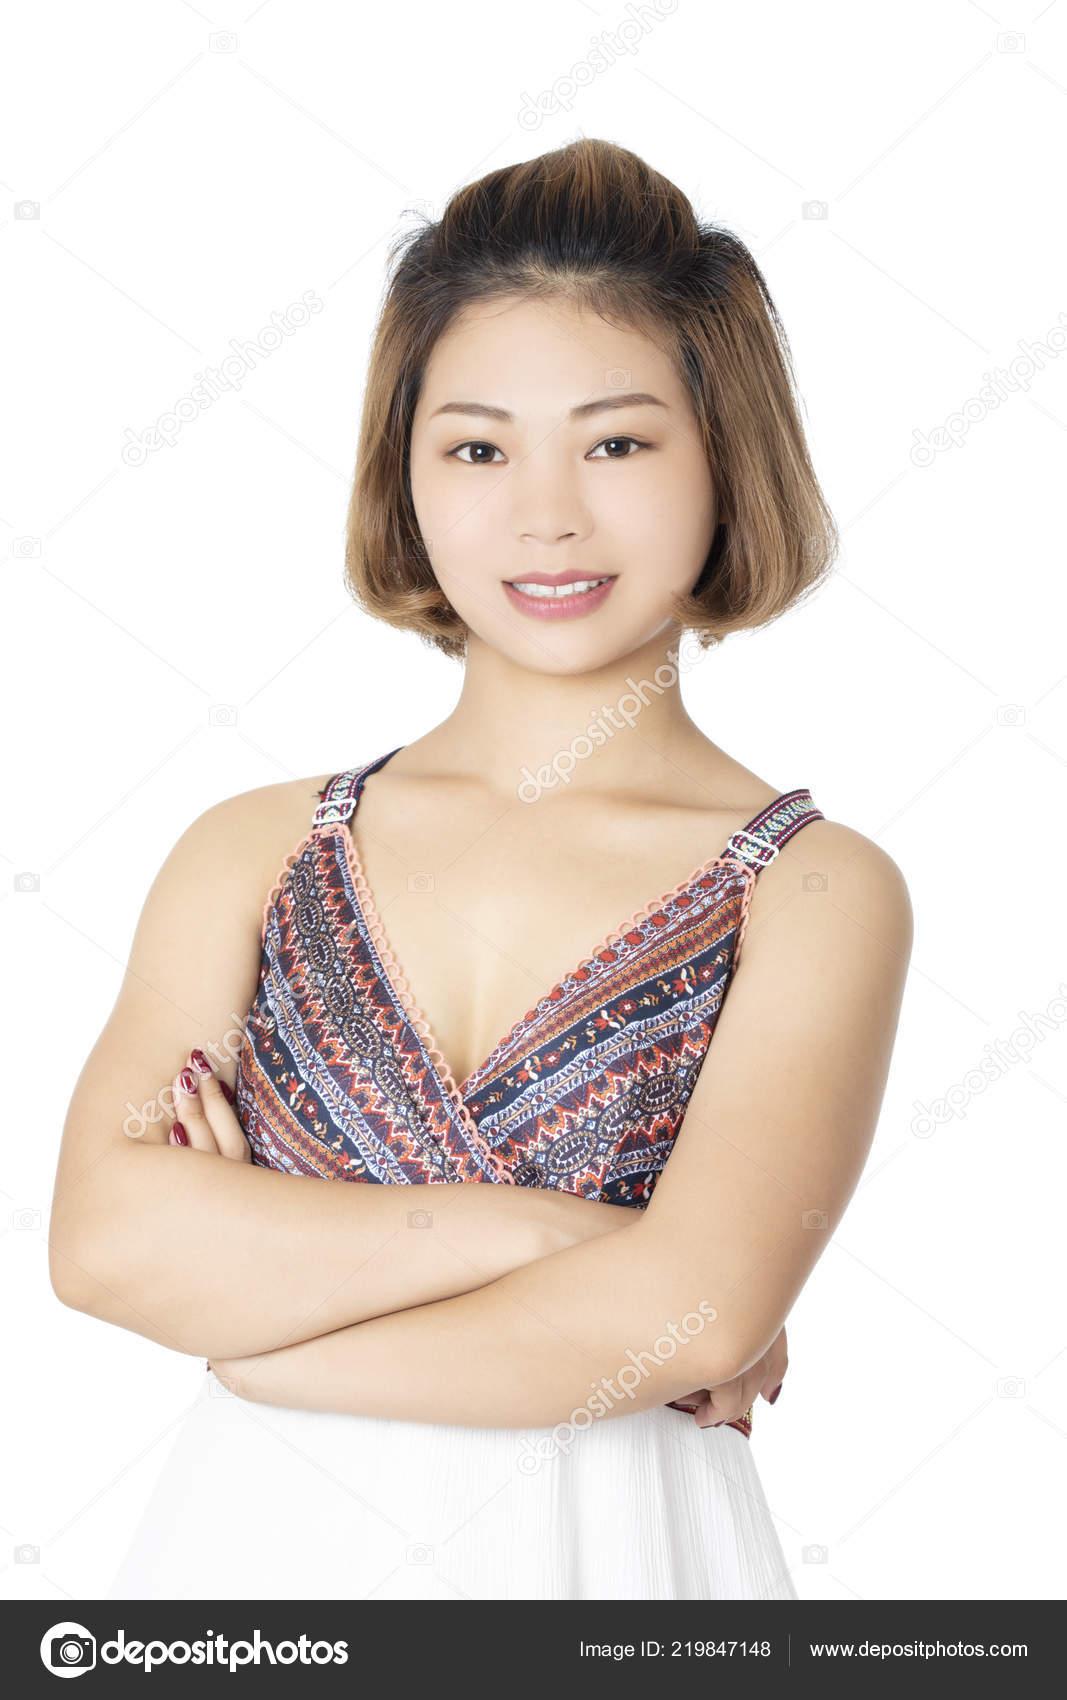 280e7549d Hermosa Mujer China Vestida Ropa Casual Aislado Sobre Fondo Blanco — Fotos  de Stock